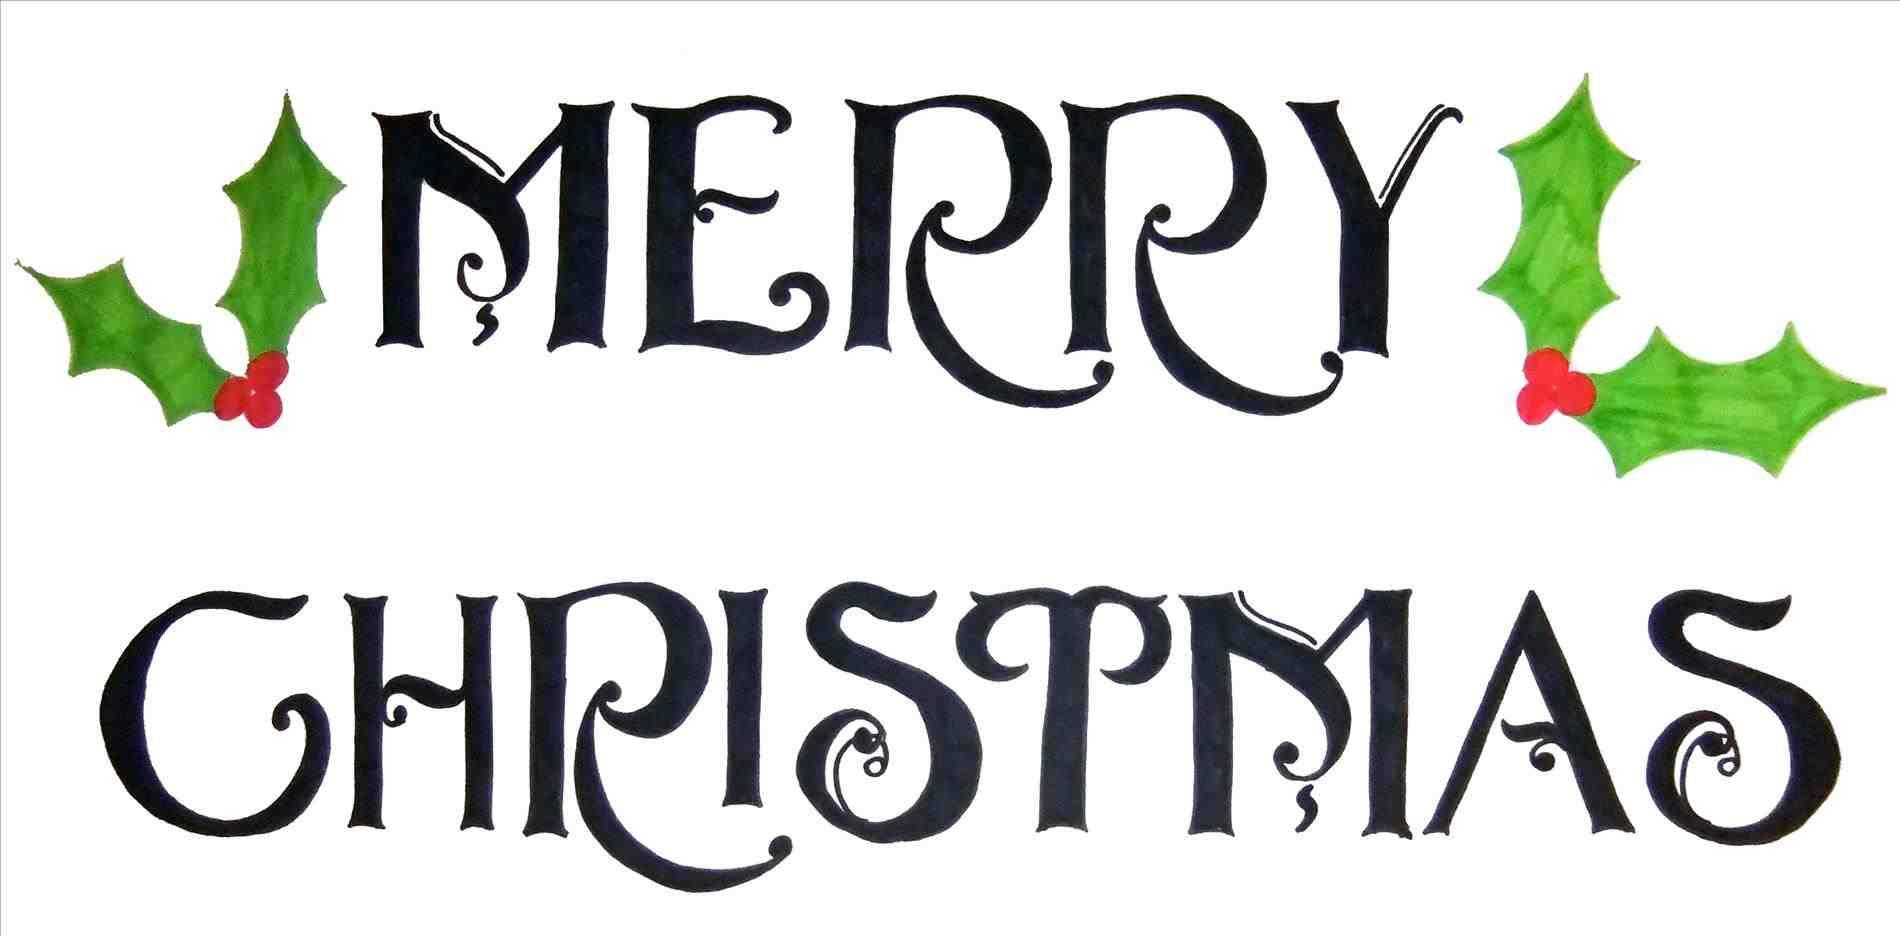 1900x936 Bies Clip Art Wallpapers U Backgrounds Clip Merry Christmas